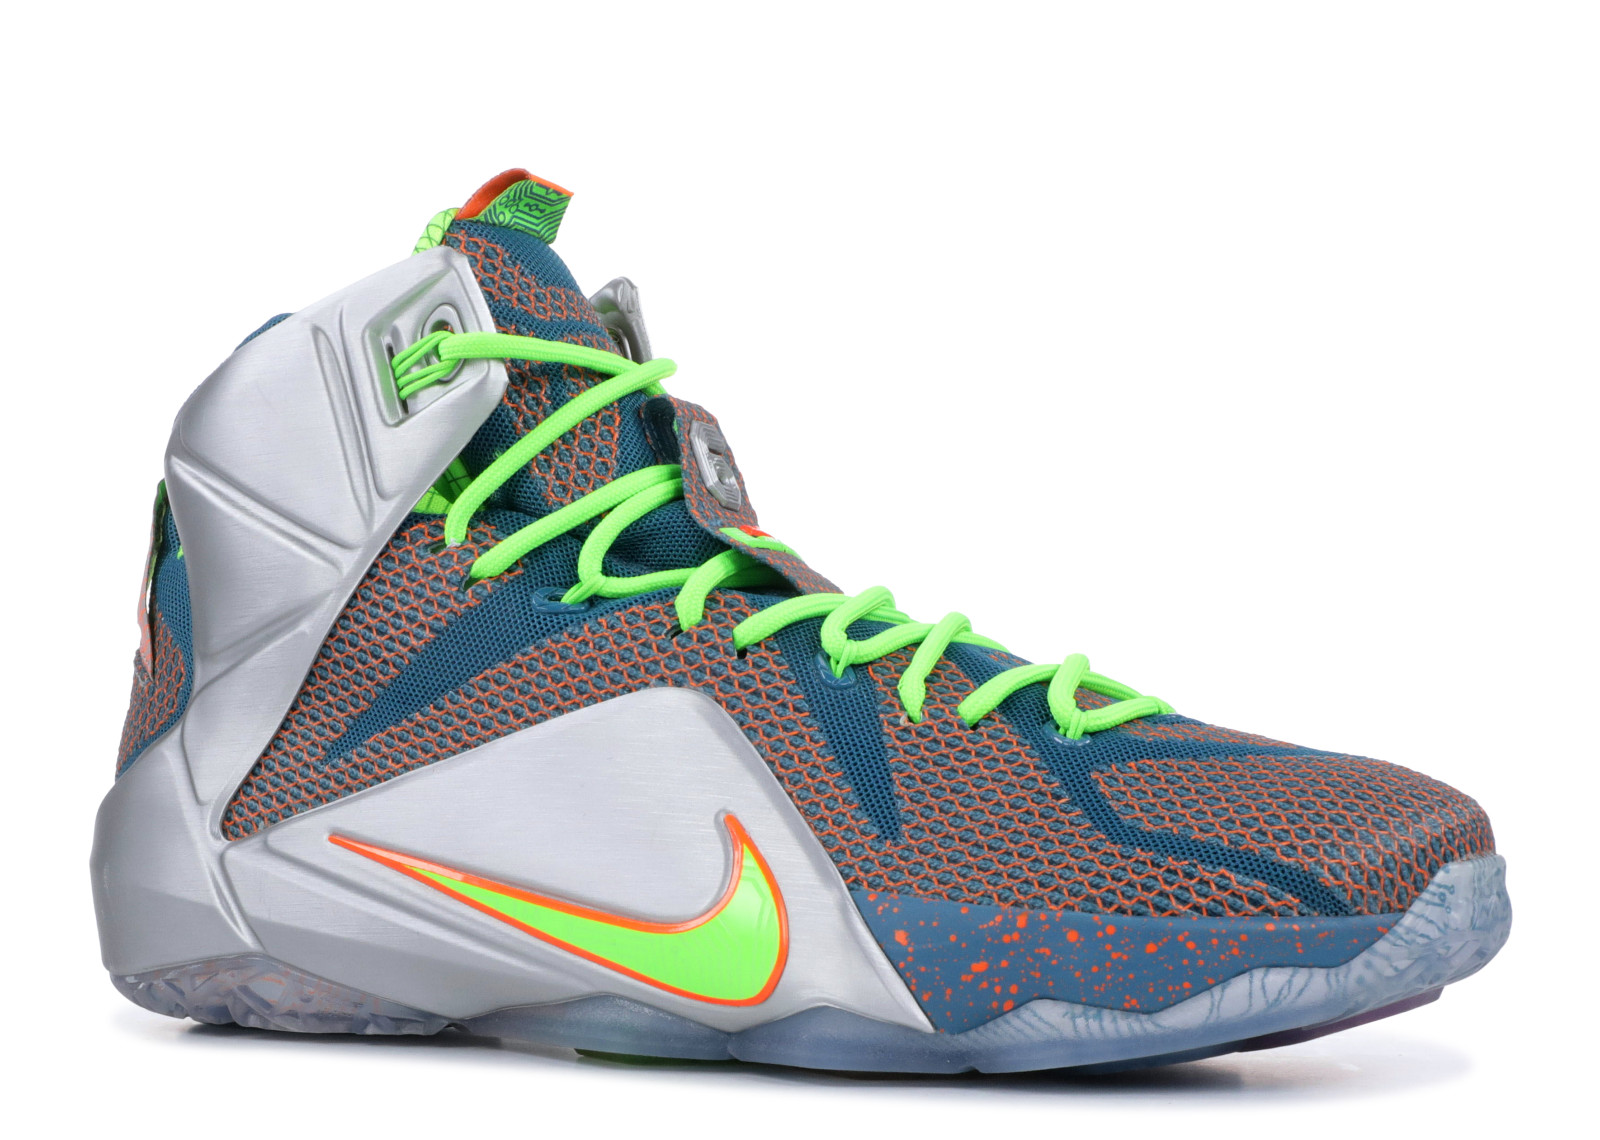 d6c42cf7cedf Nike - Men - Lebron 12 Prm  Trillion Dollar Man  - 705410-430 - Size 10